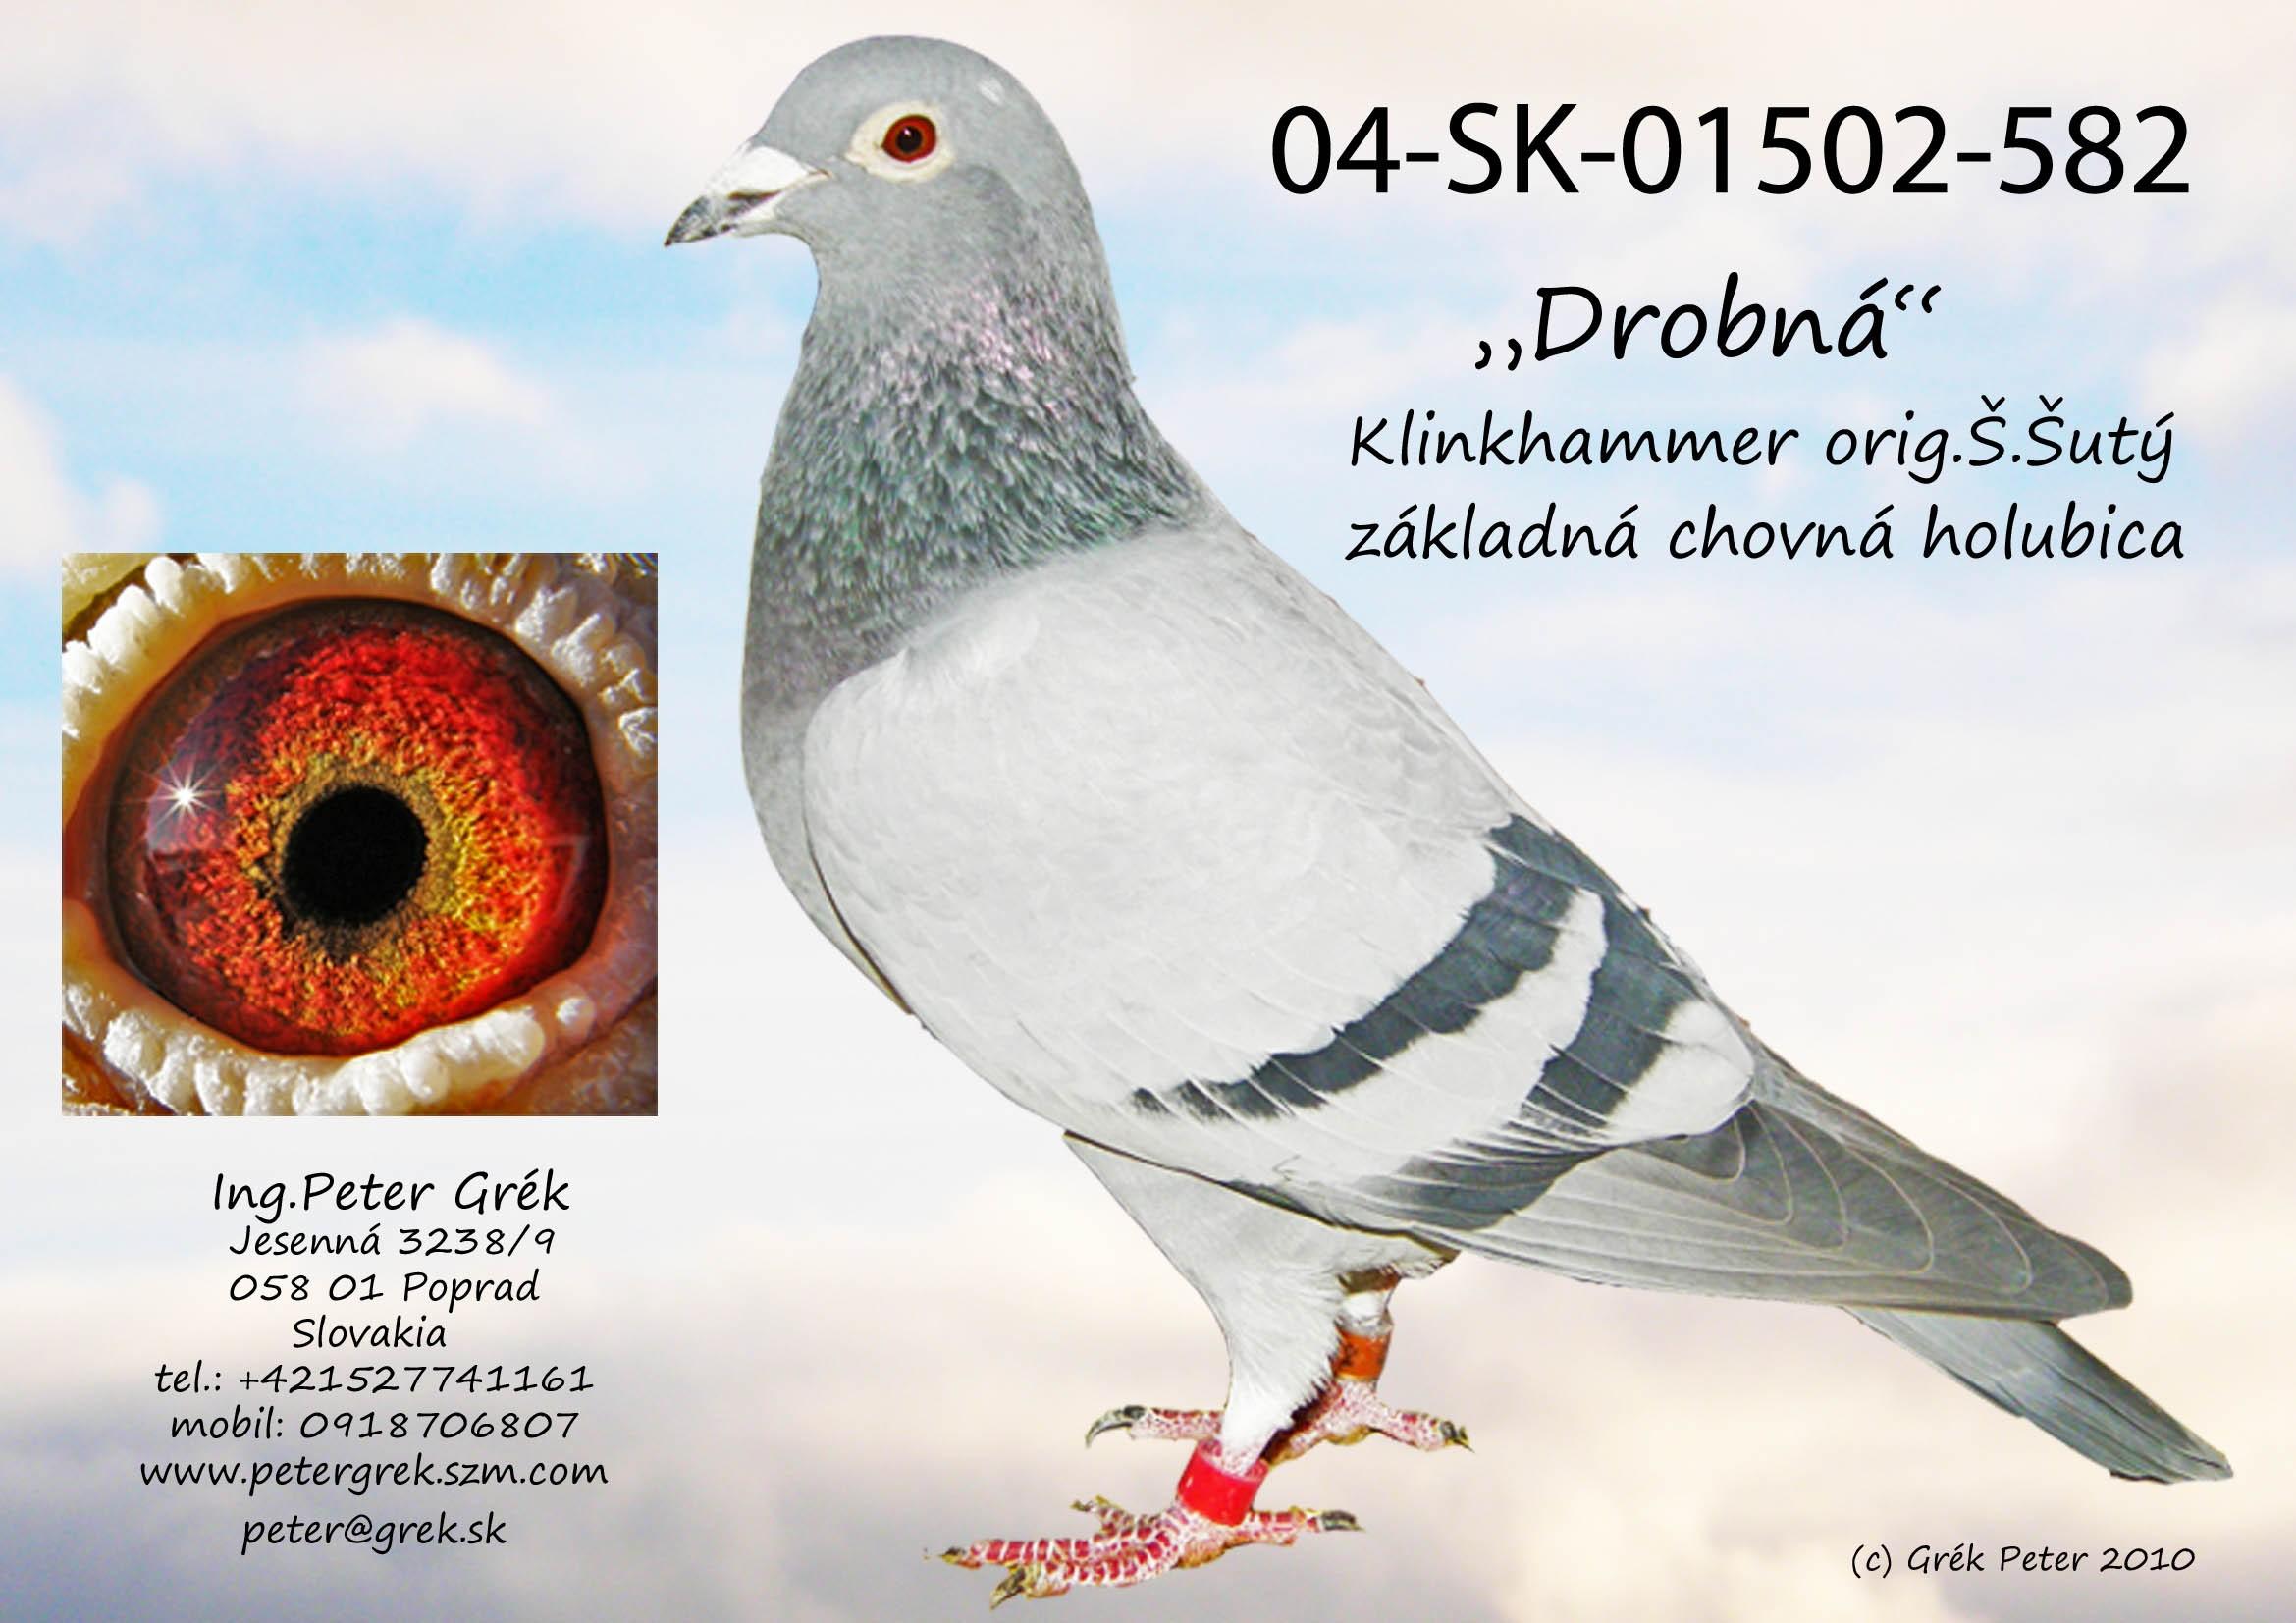 SK-2004-01502-582